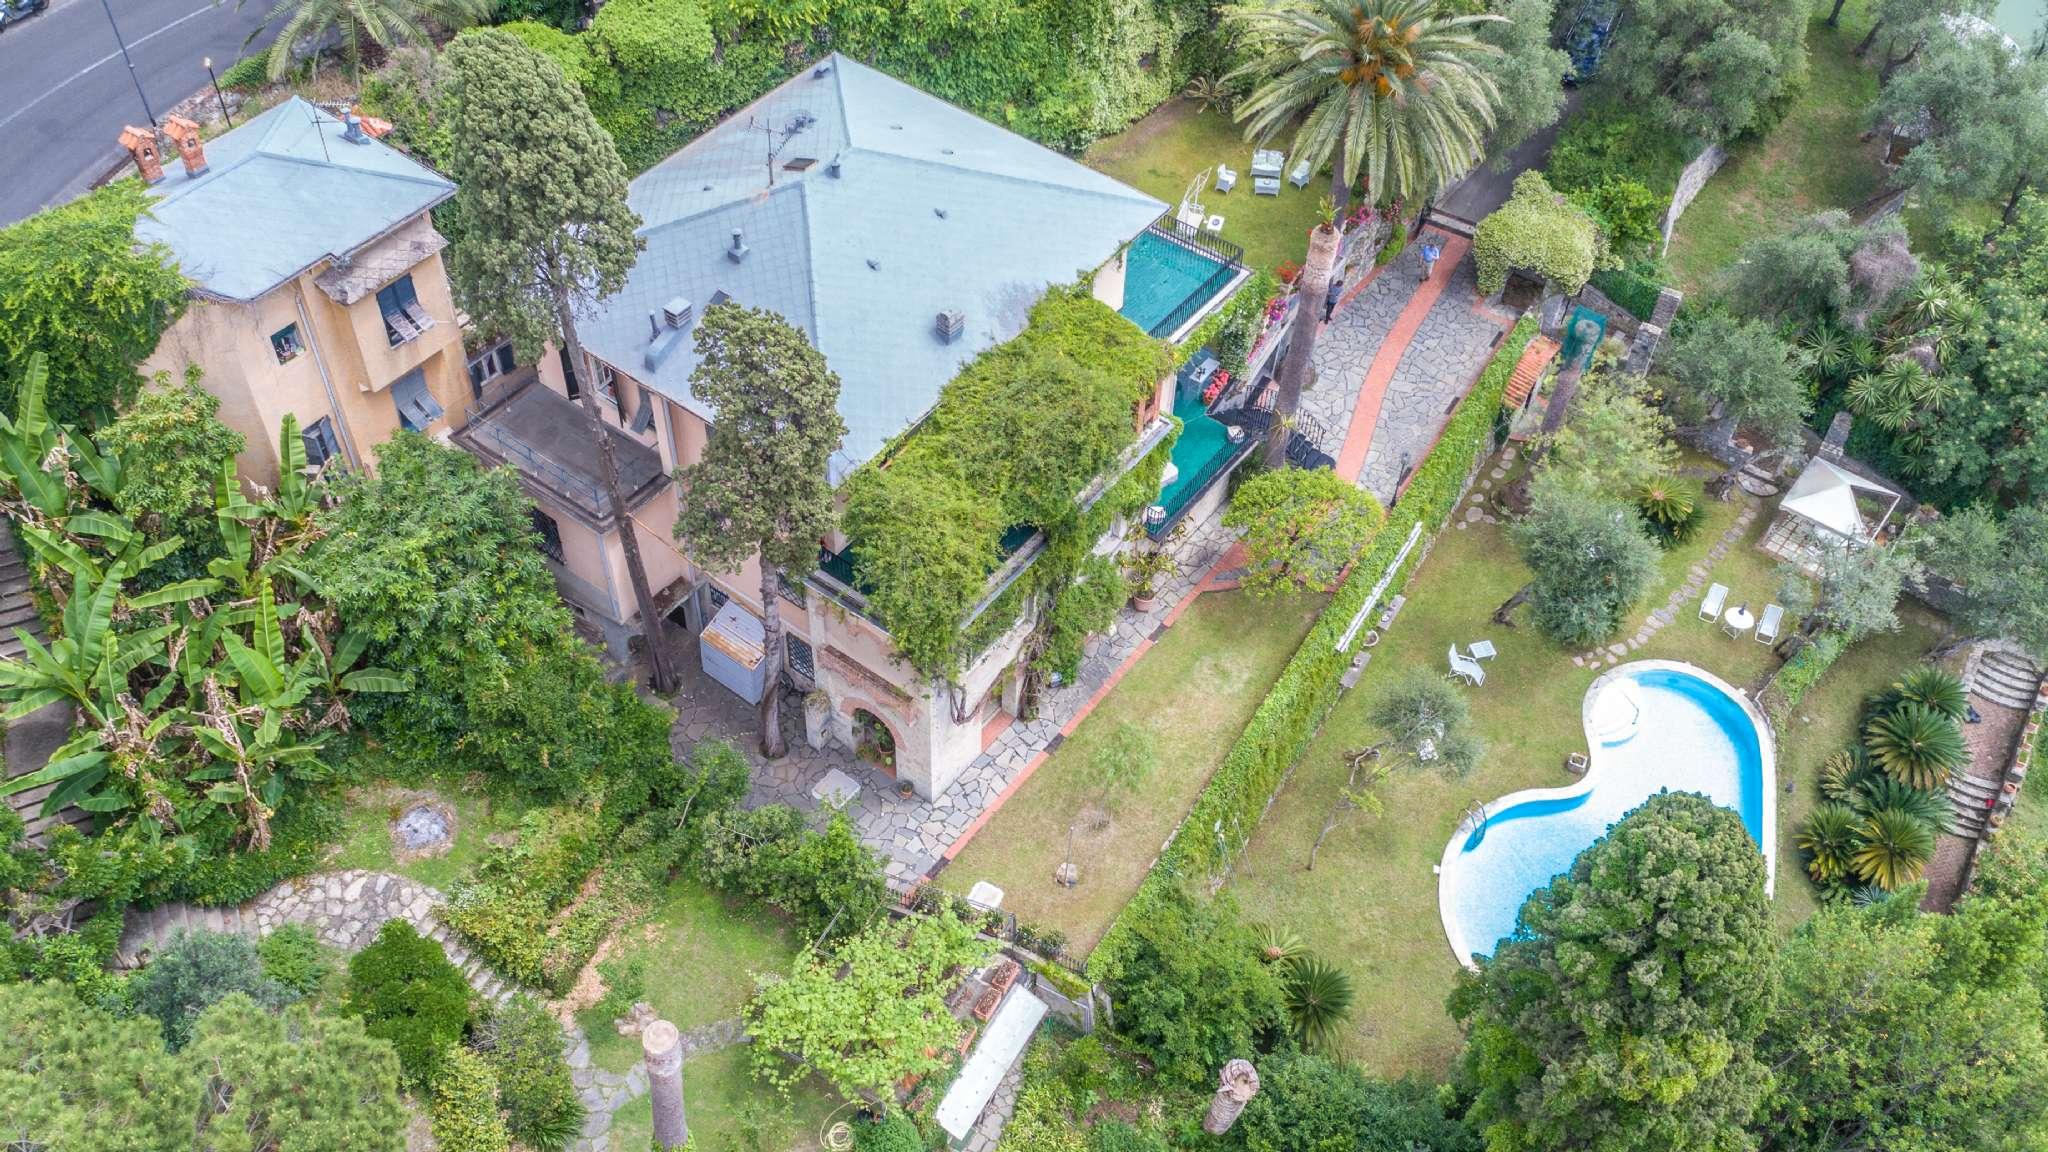 Villa in Vendita a Santa Margherita Ligure: 0 locali, 530 mq - Foto 3